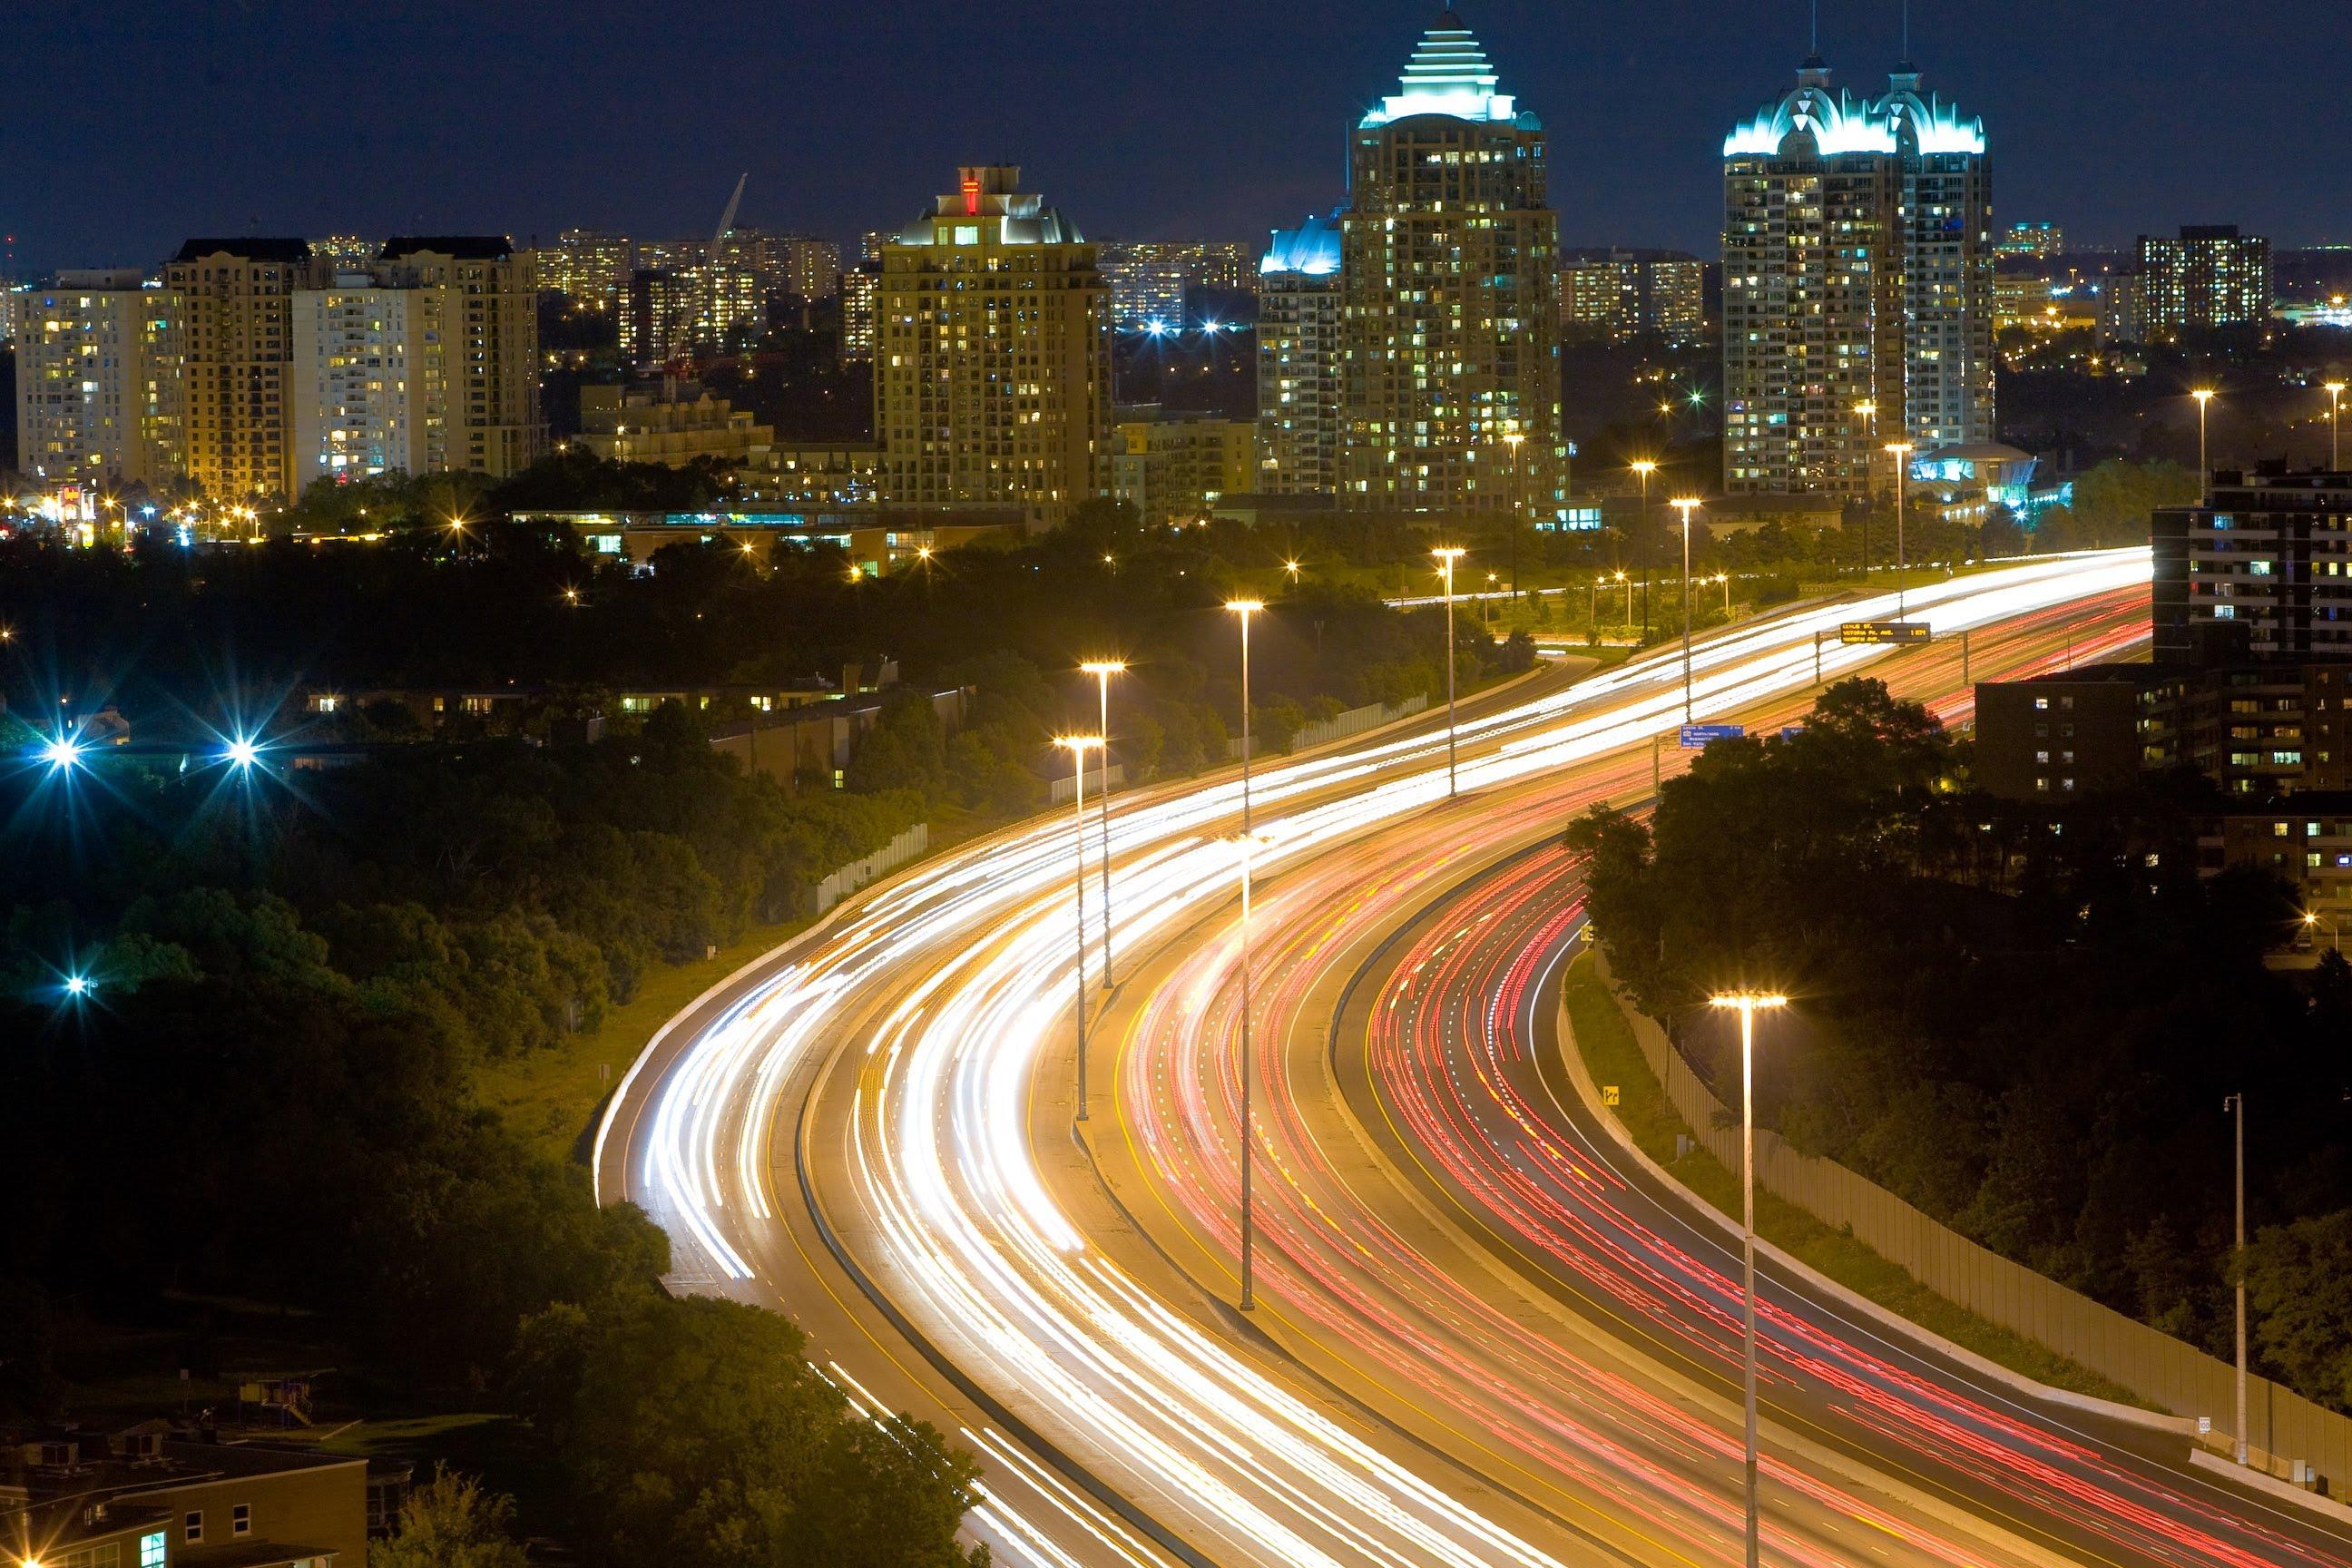 Highway 401 Night Drive - YouTube